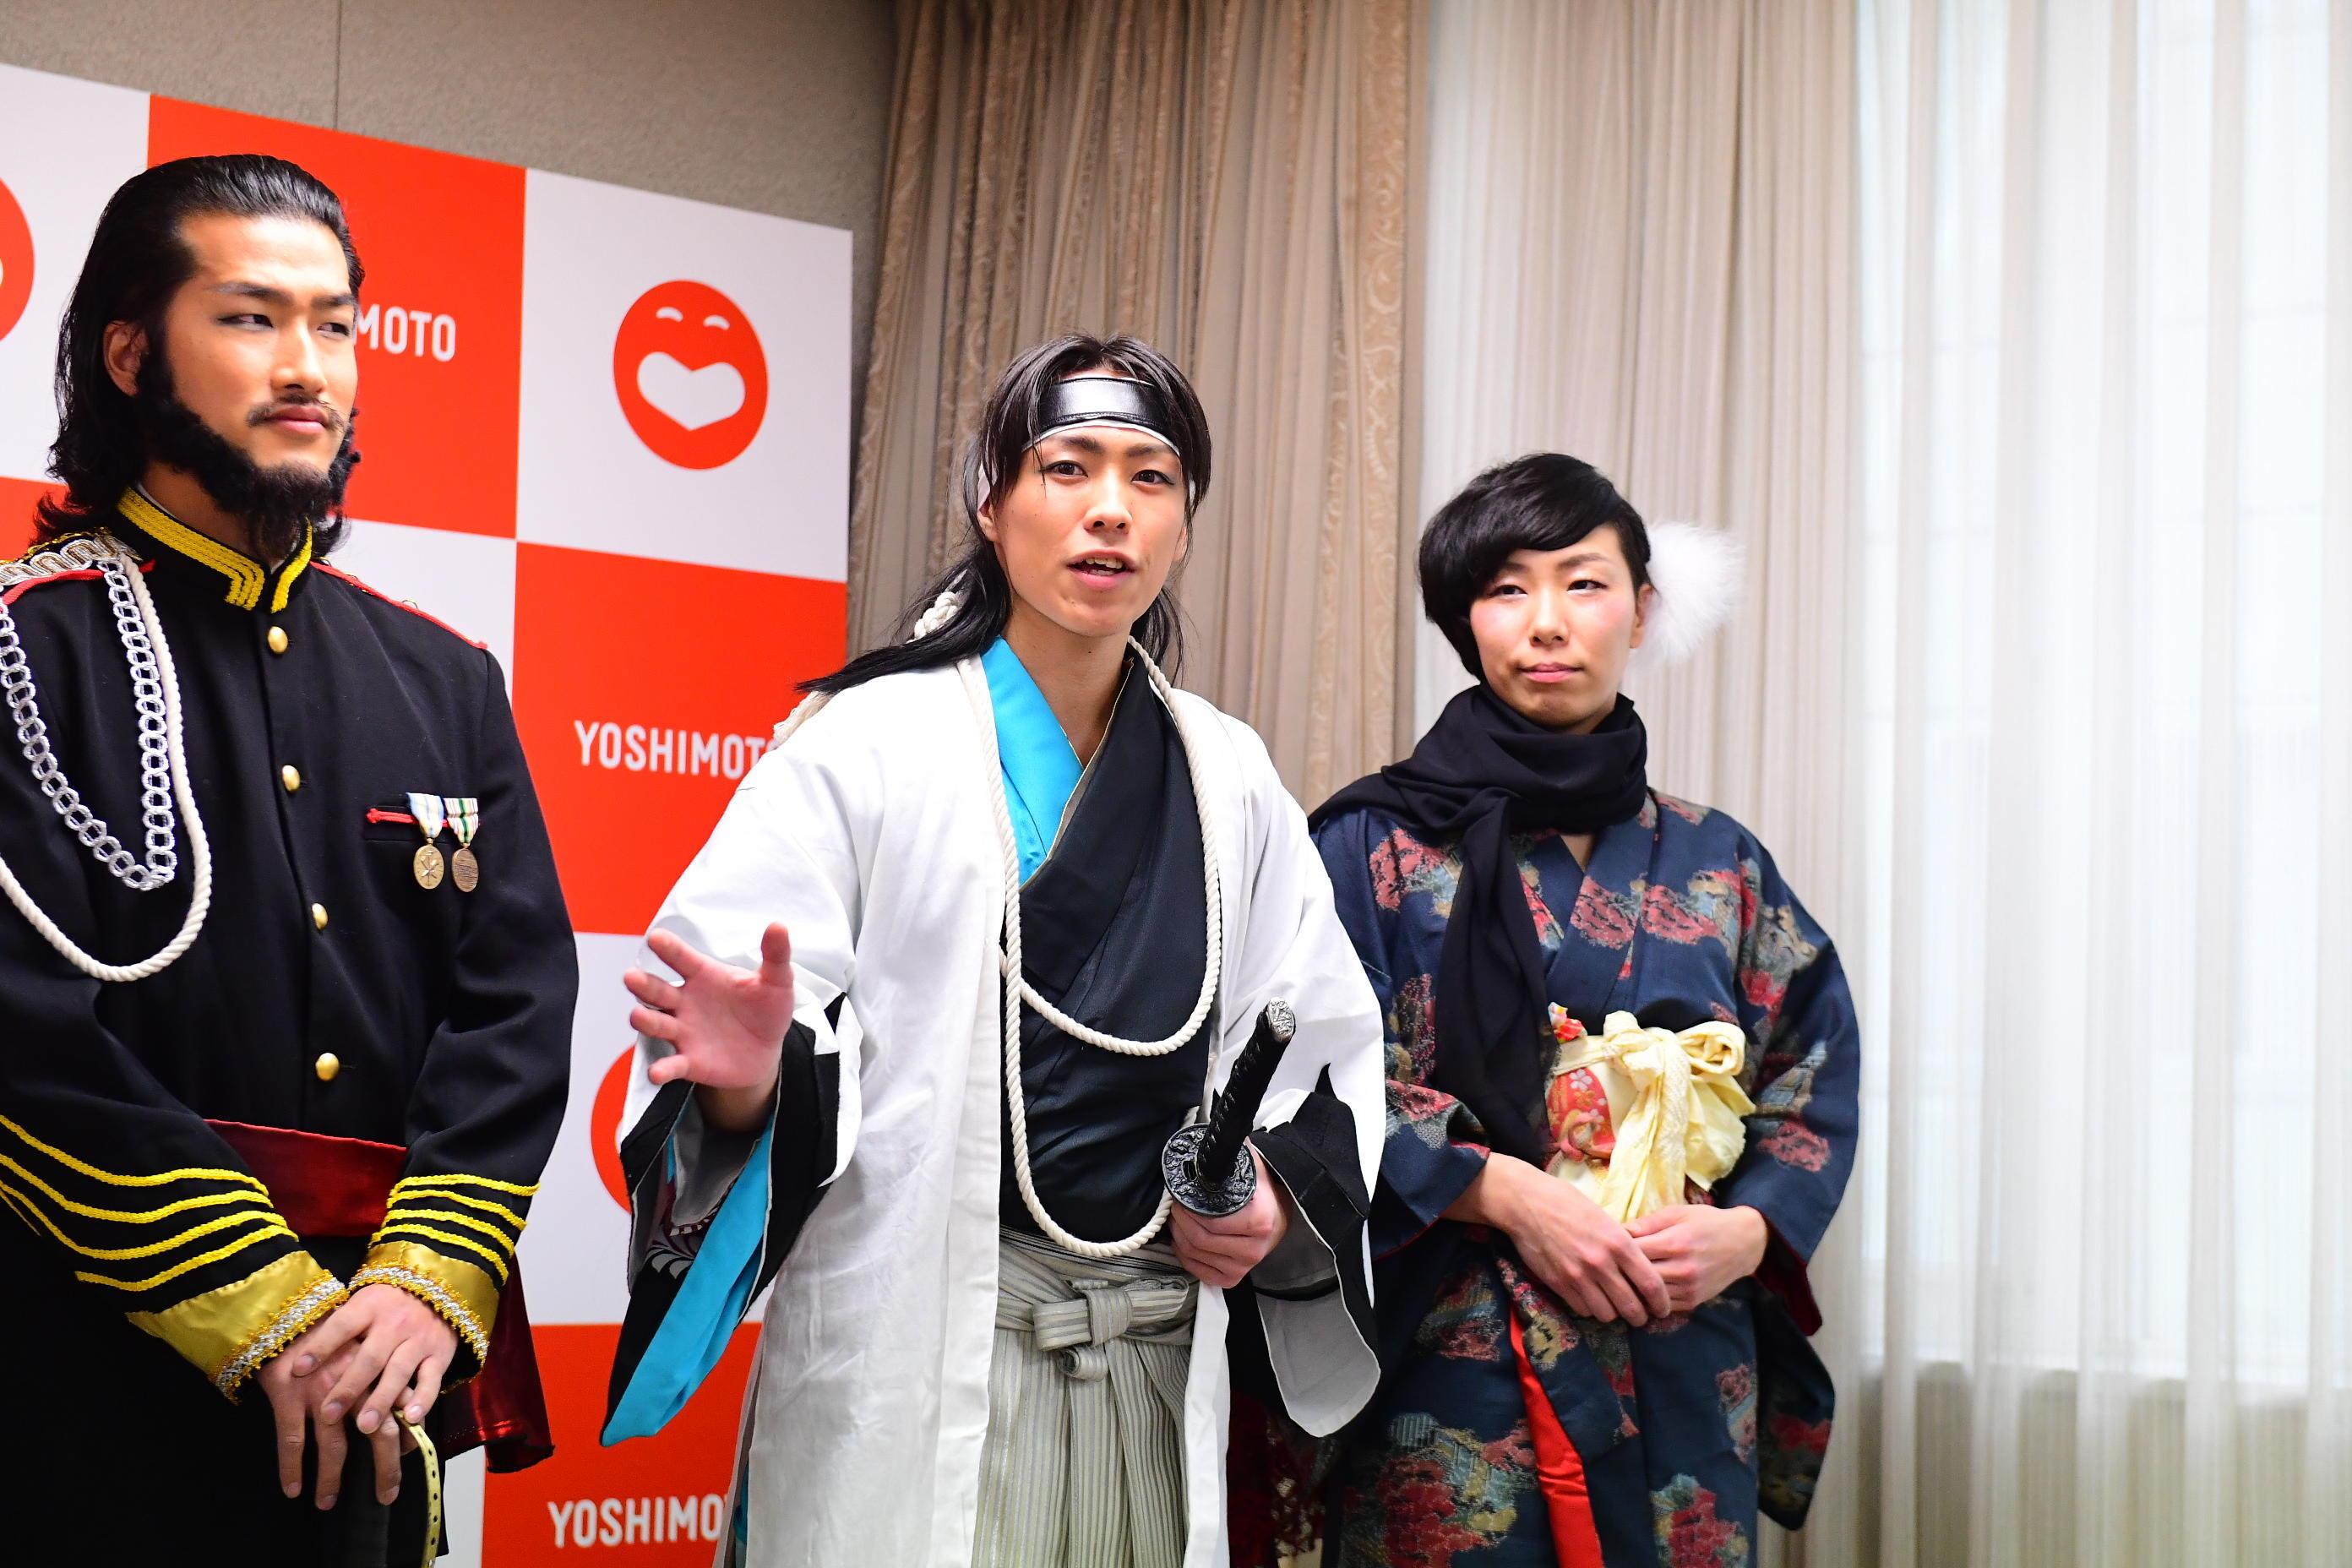 http://news.yoshimoto.co.jp/20170223194029-cfd1a64b38f4d1dc24b843404b16a2b1a4f0a6df.jpg